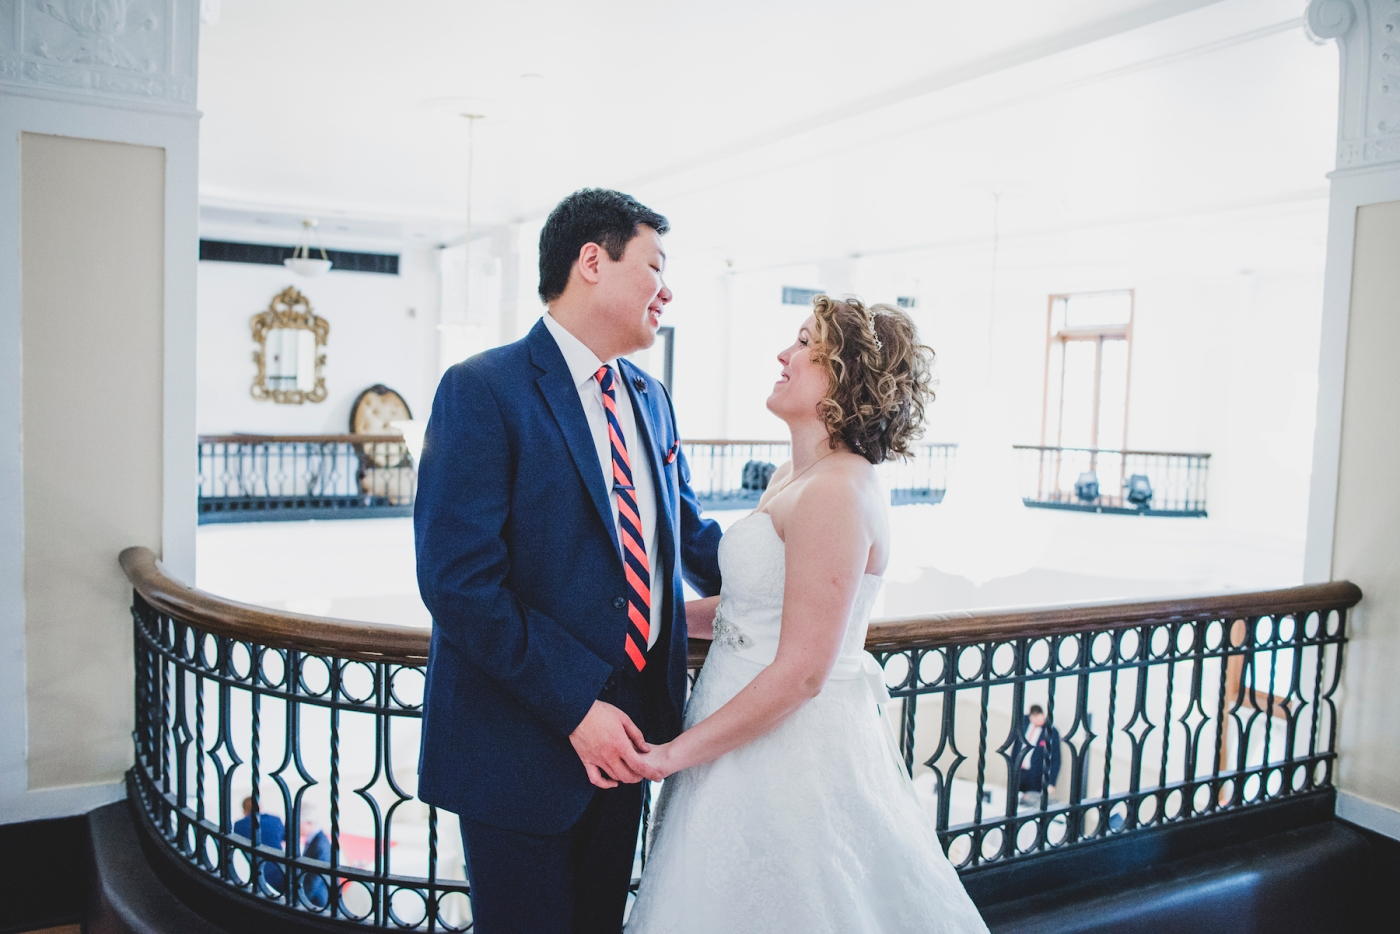 DSC_2075Everett_Wedding_Ballroom_Jane_Speleers_photography_Rachel_and_Edmund_First_look_2017